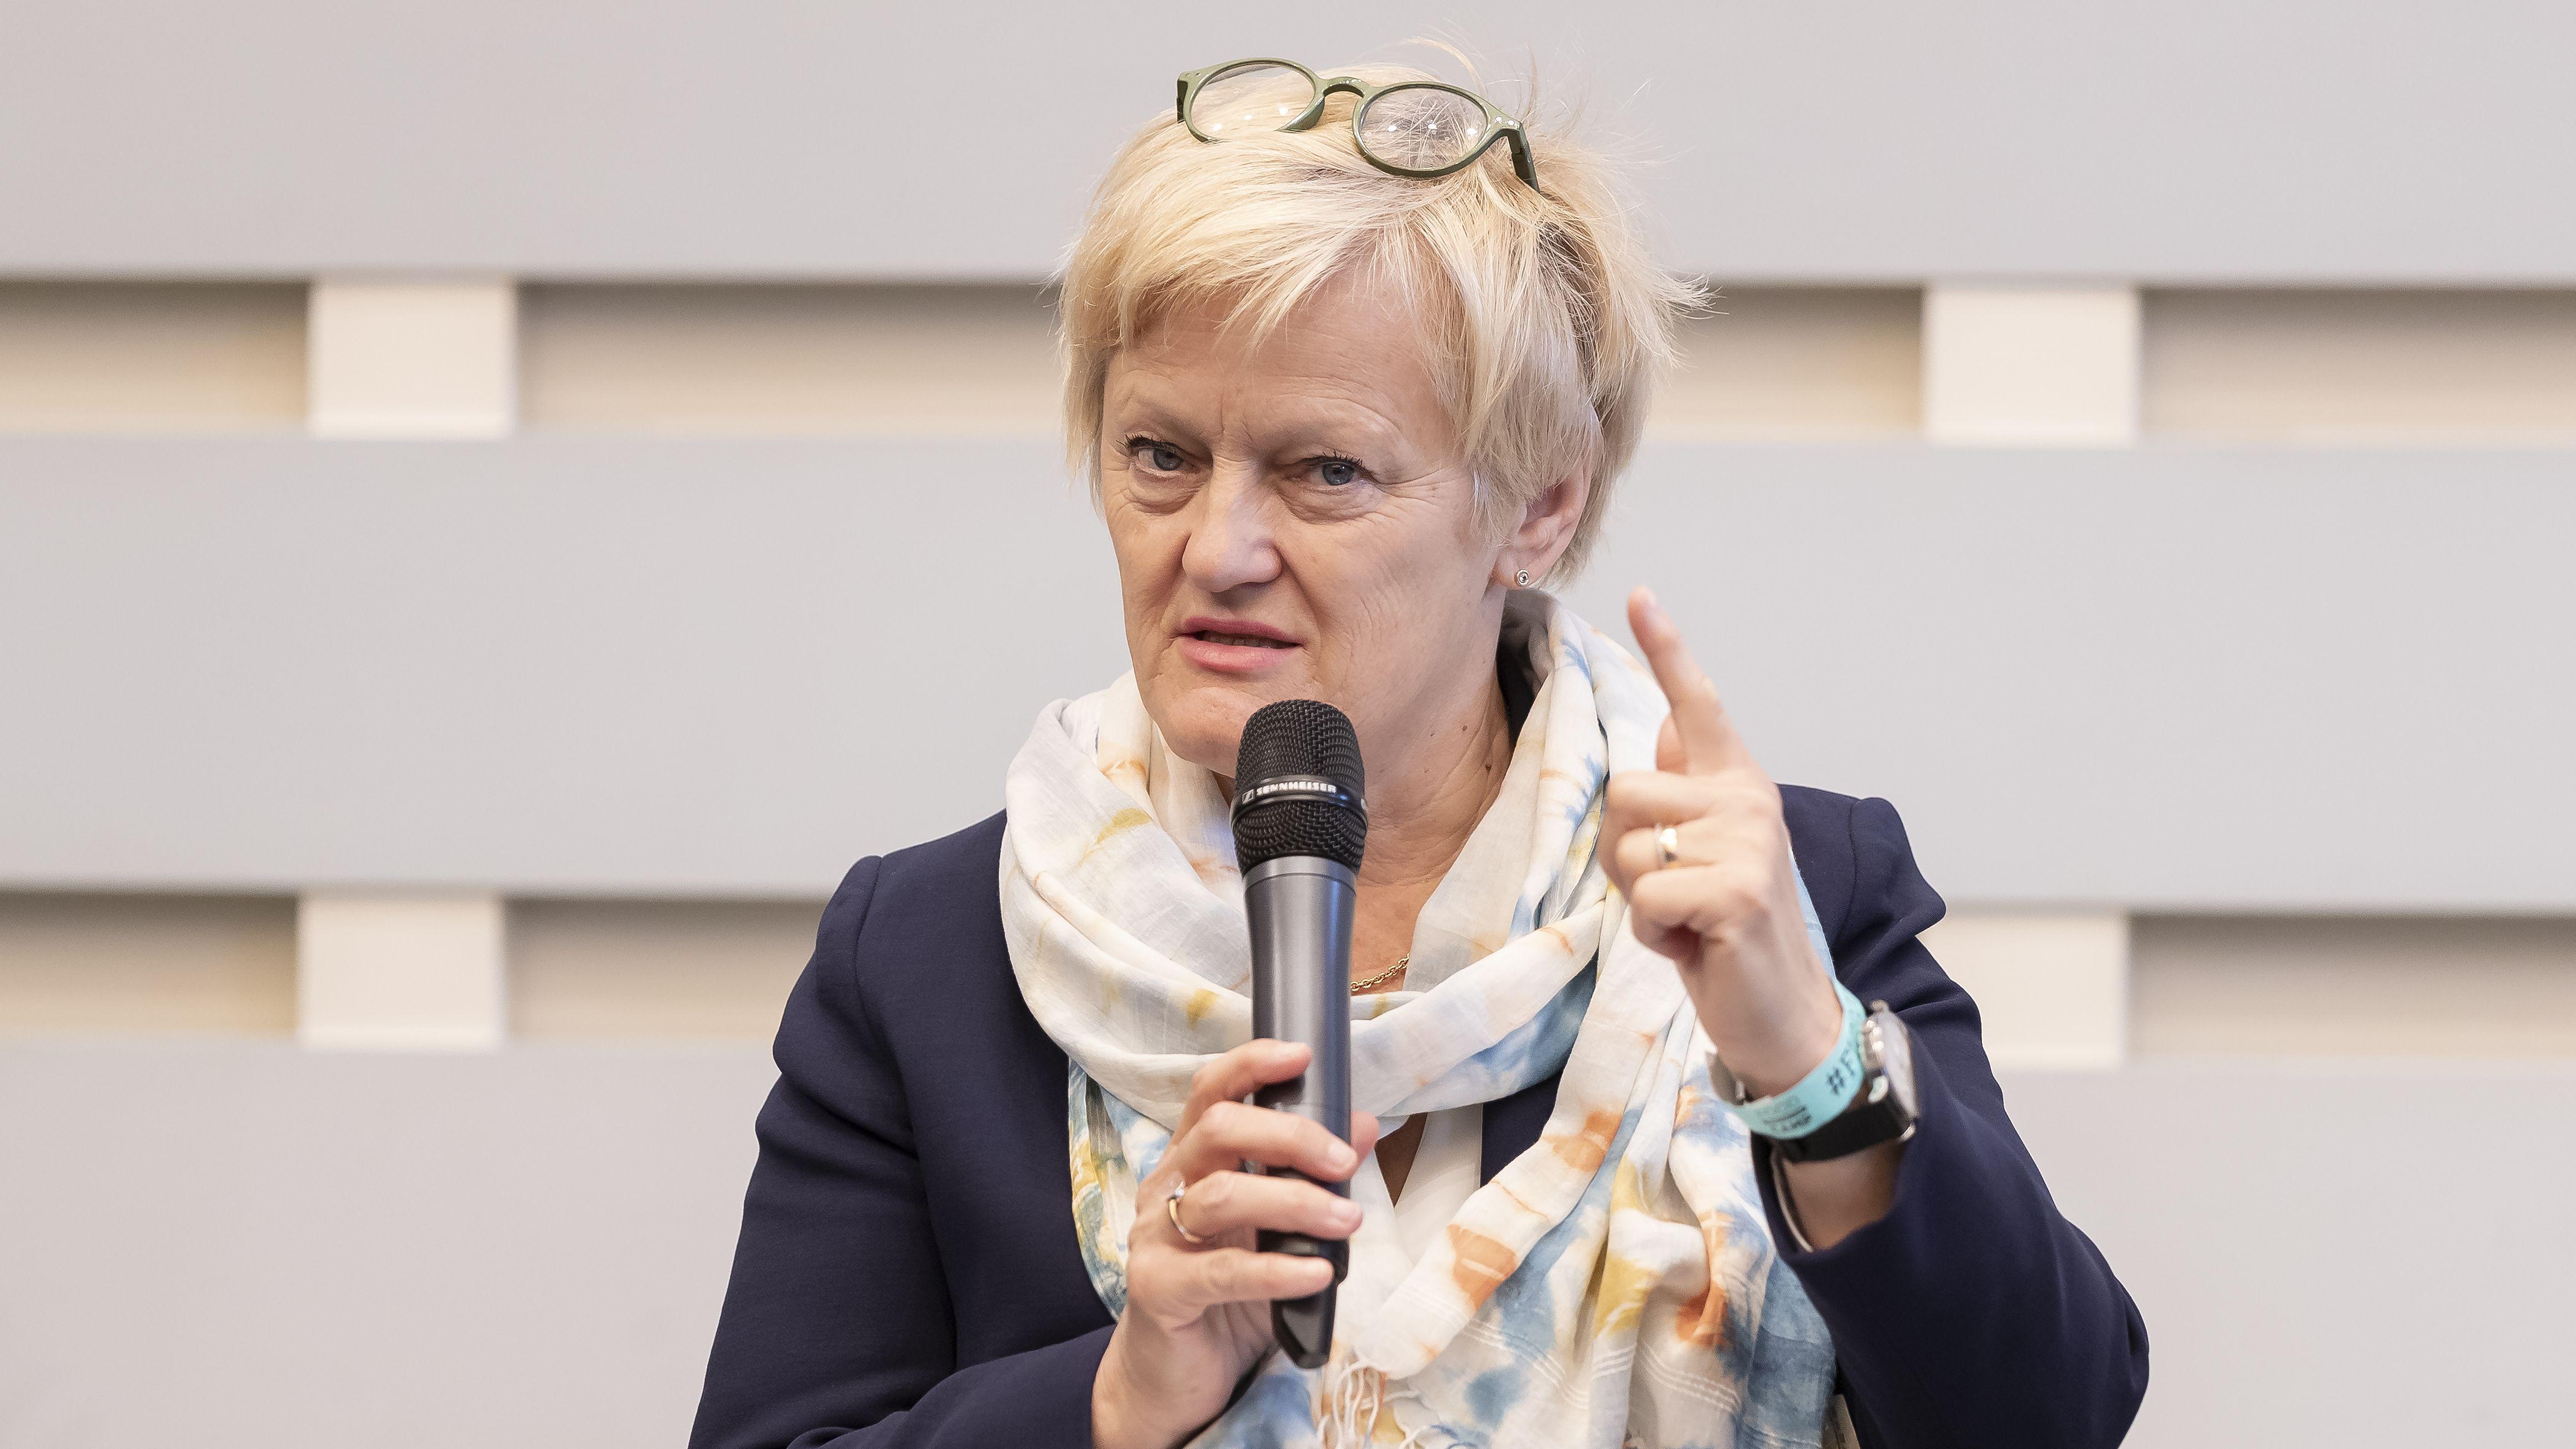 Renate Künast, Grünen-Politikerin